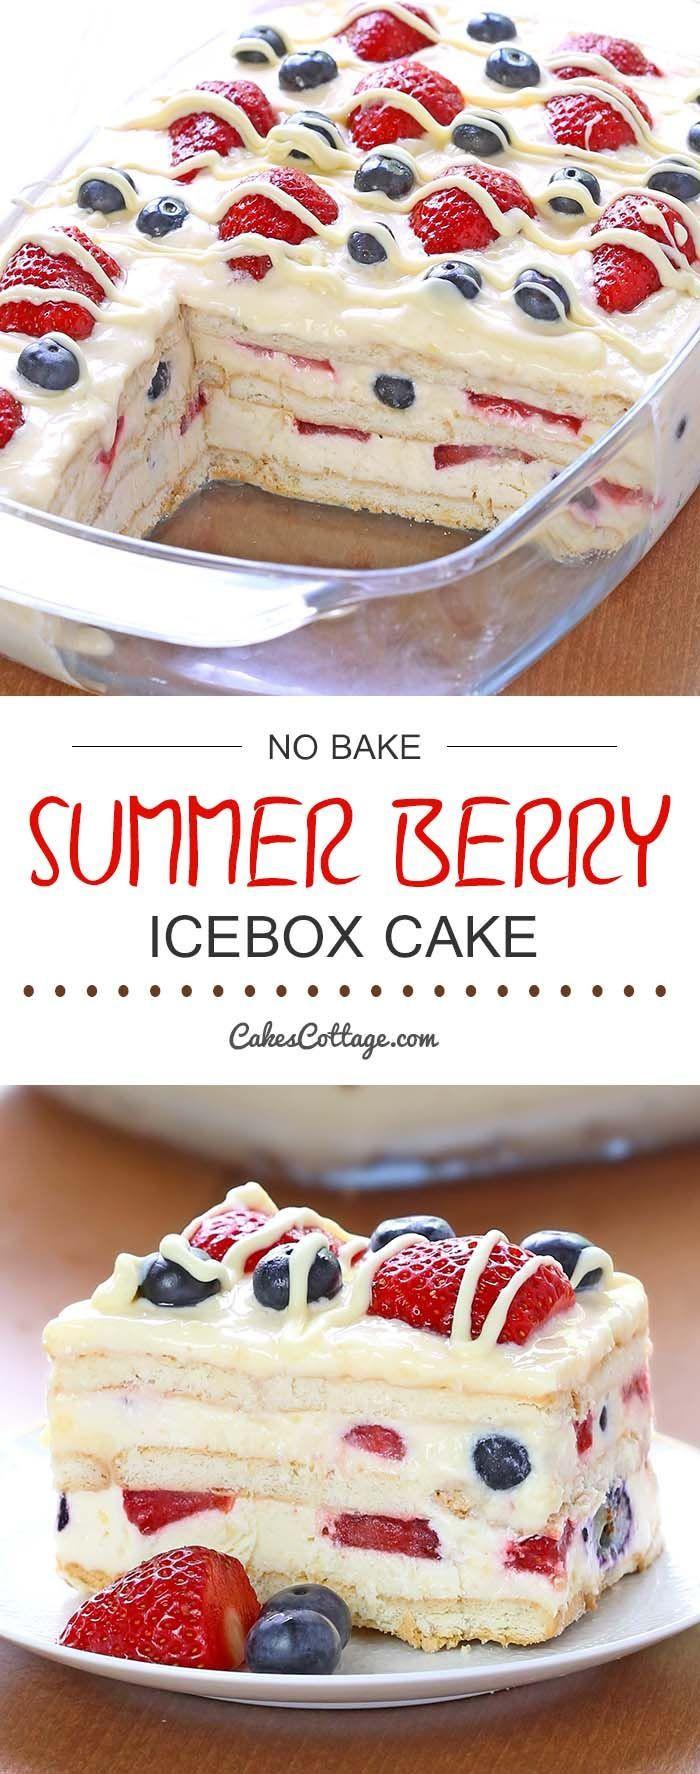 Easy Summer Desserts  No Bake Summer Berry Icebox Cake Recipe